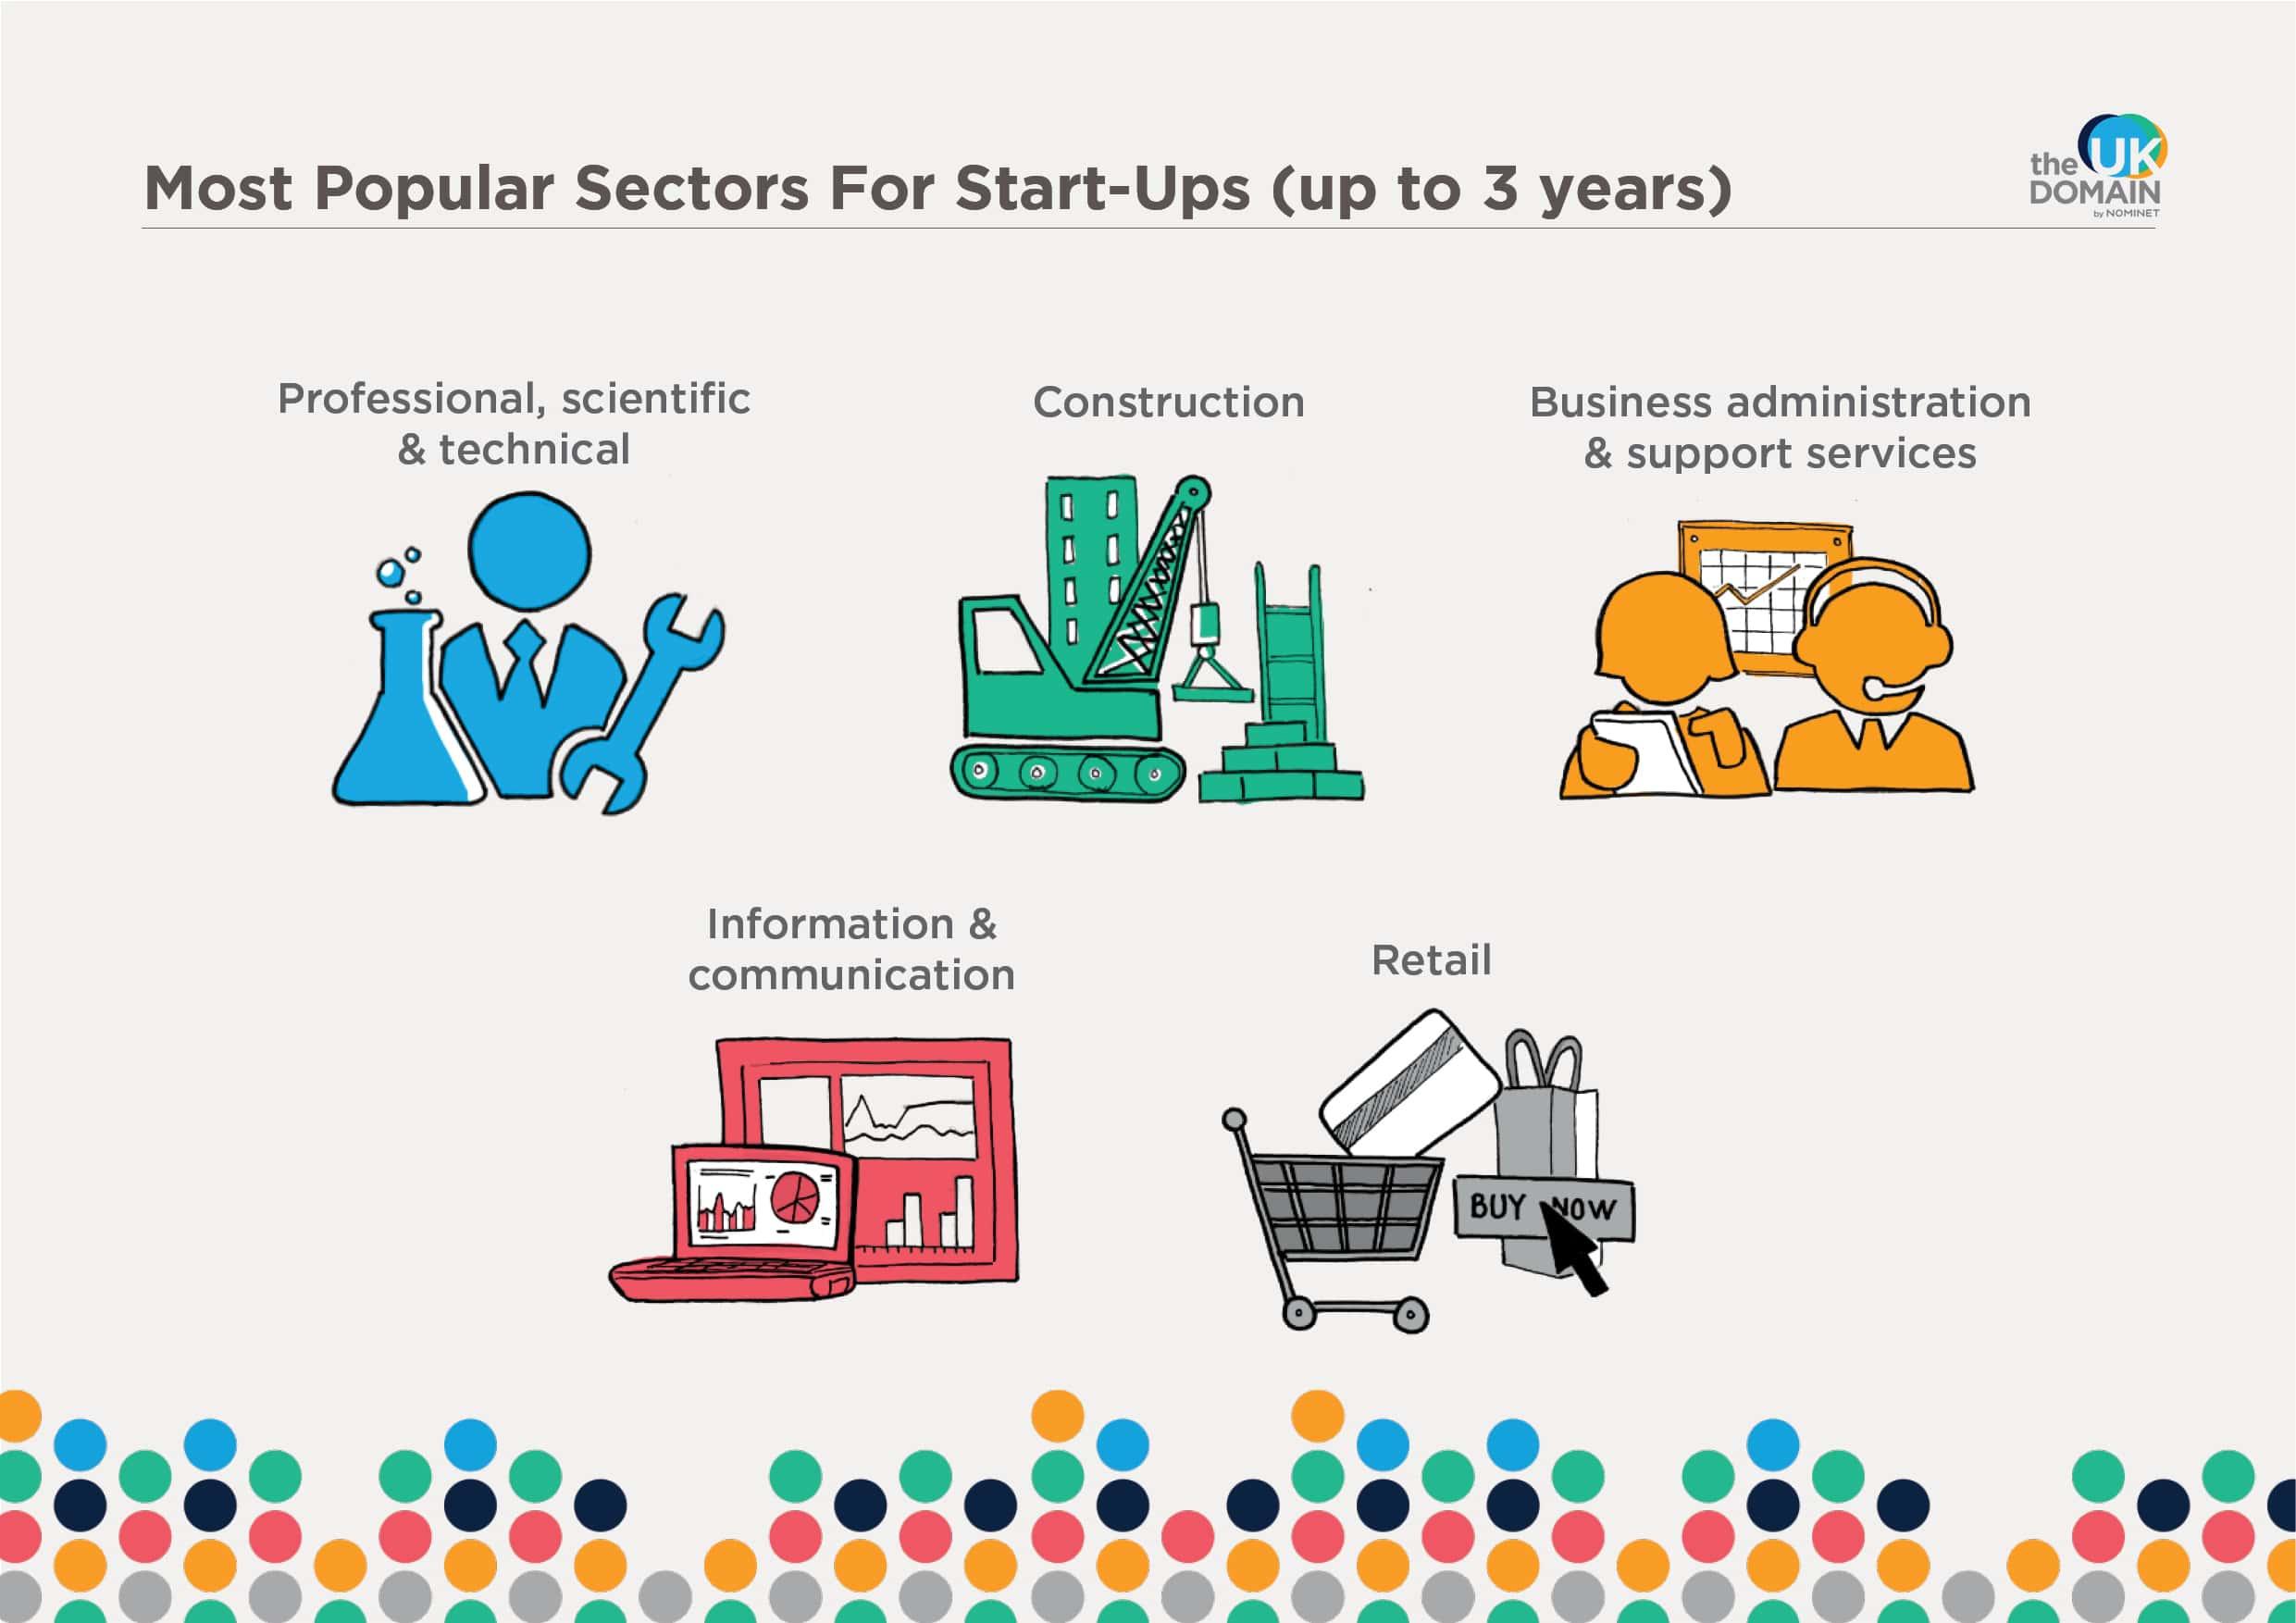 Most popular sectors for start-ups